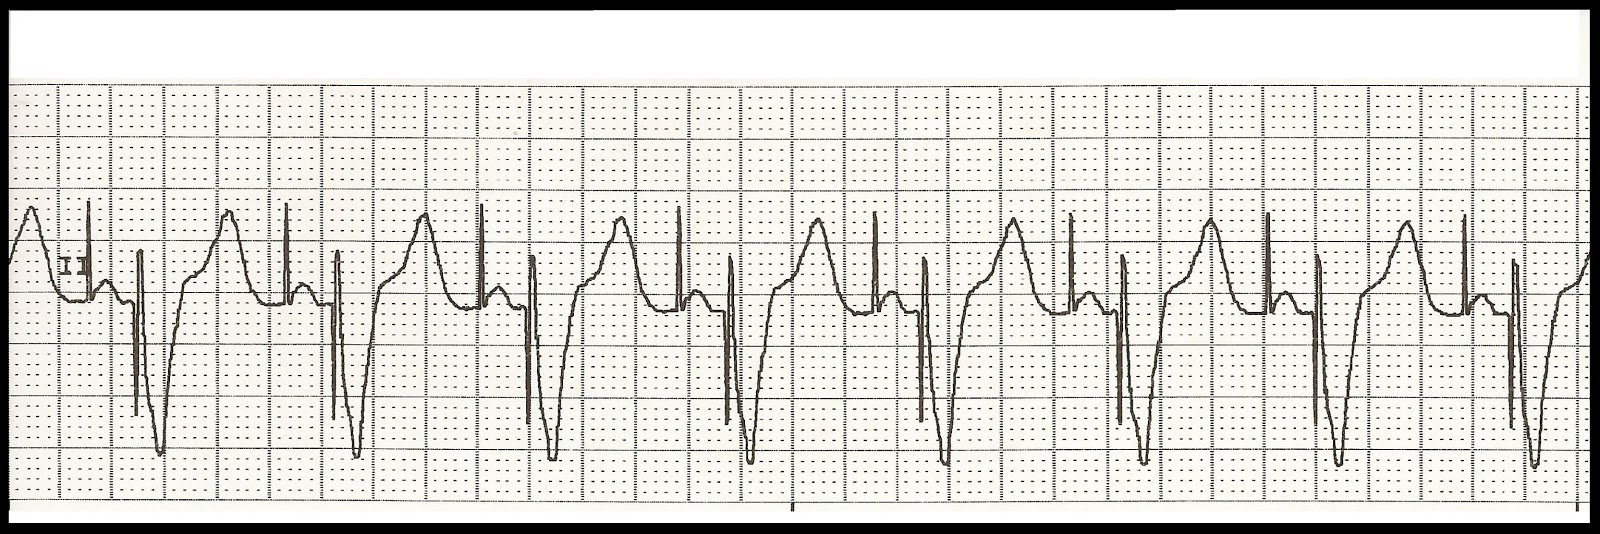 Pacemaker ecg strips ⭐ Float Nurse: